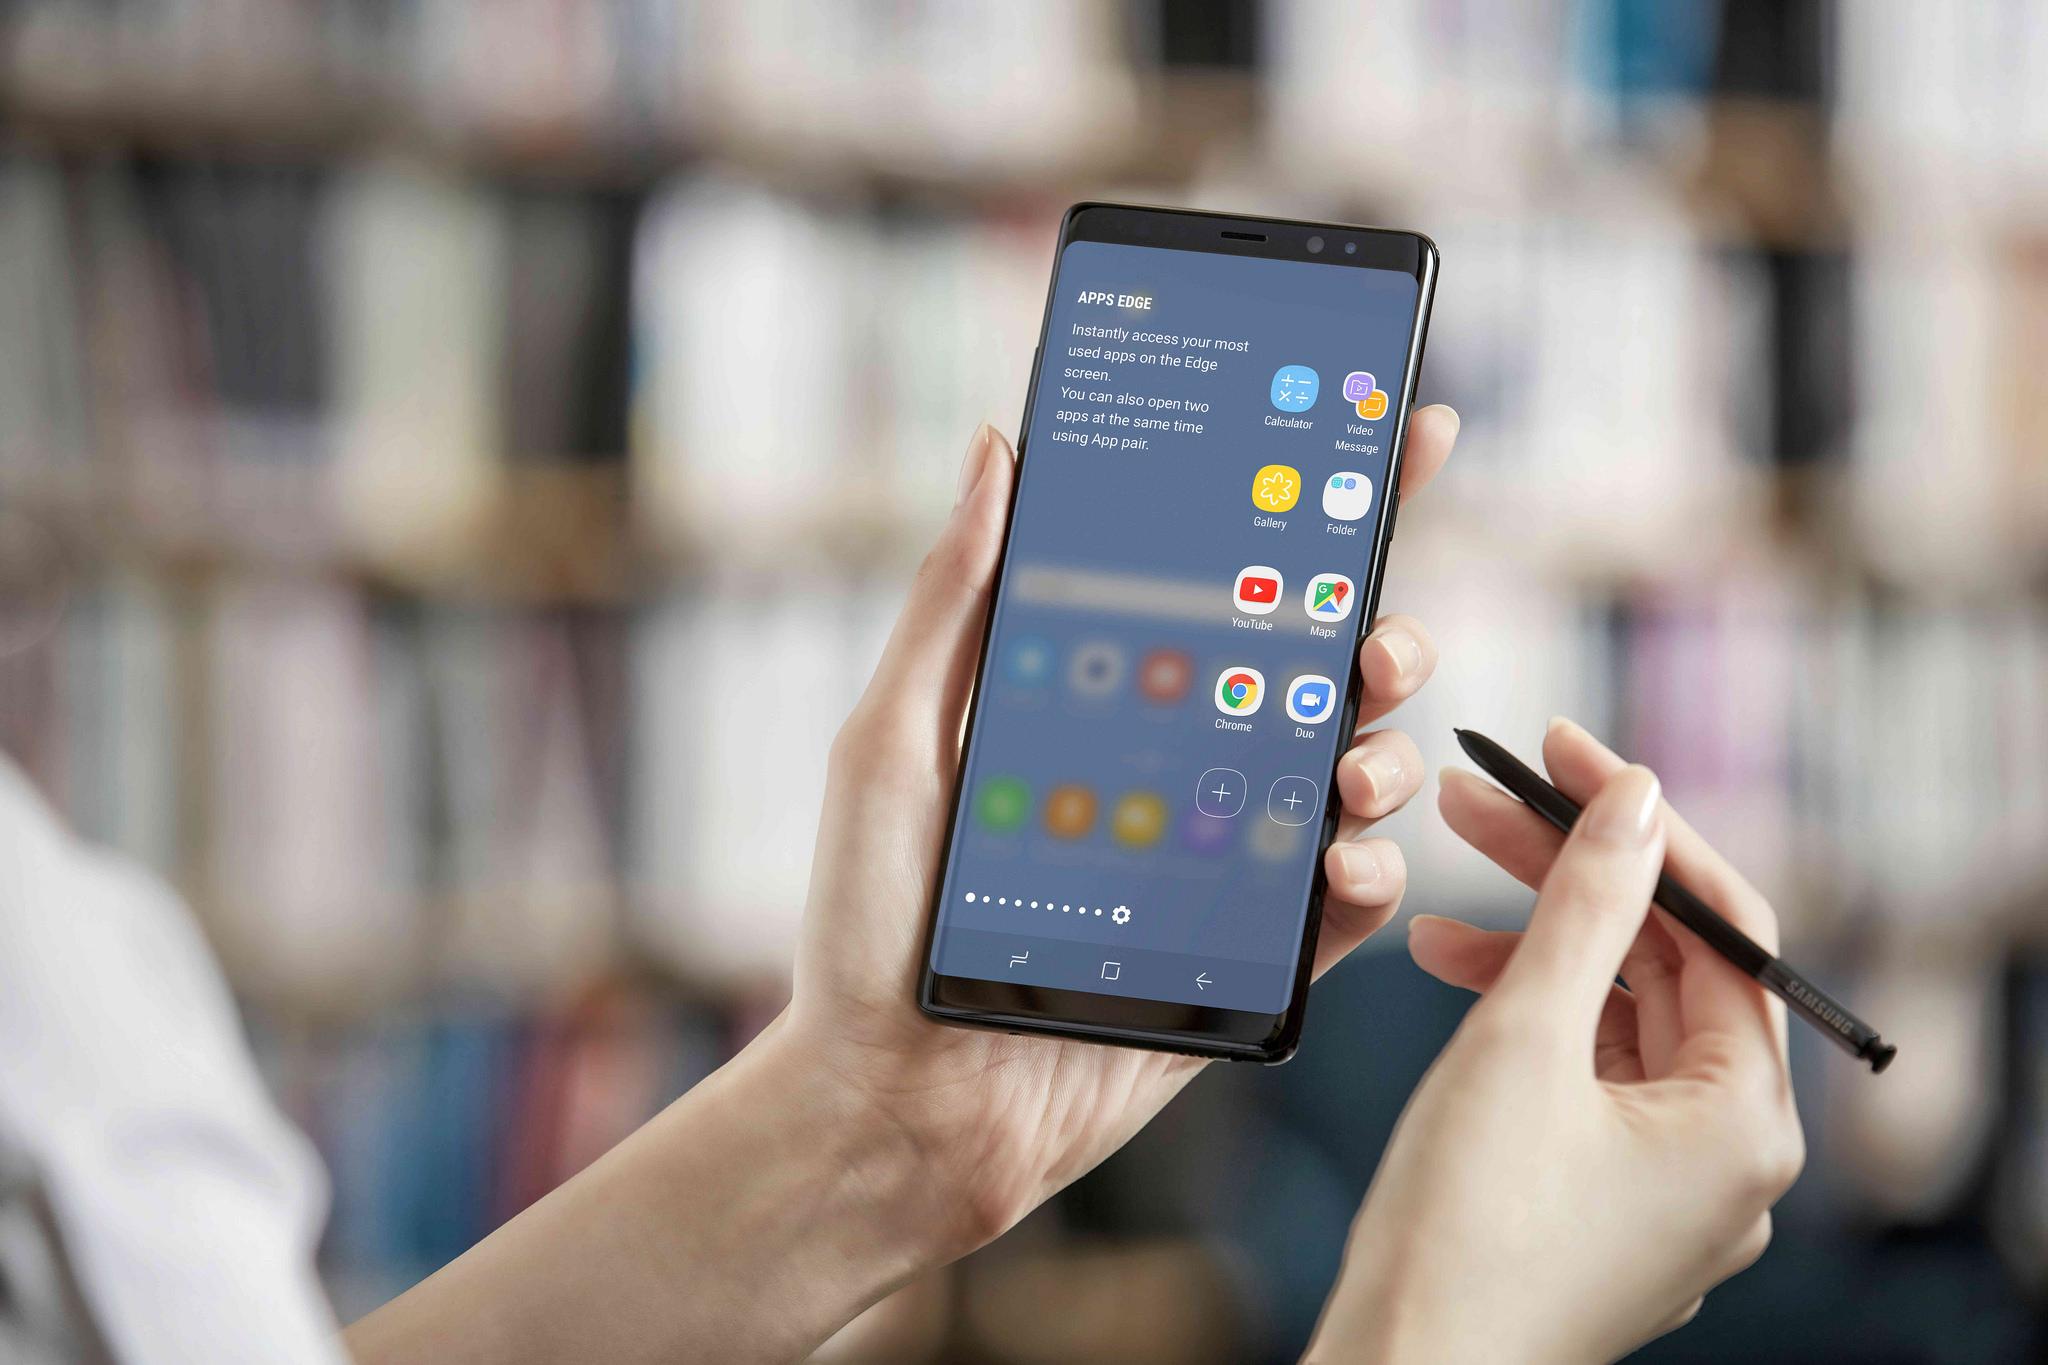 Возникла модификация Самсунг Galaxy Note 8 на2 SIM-карты